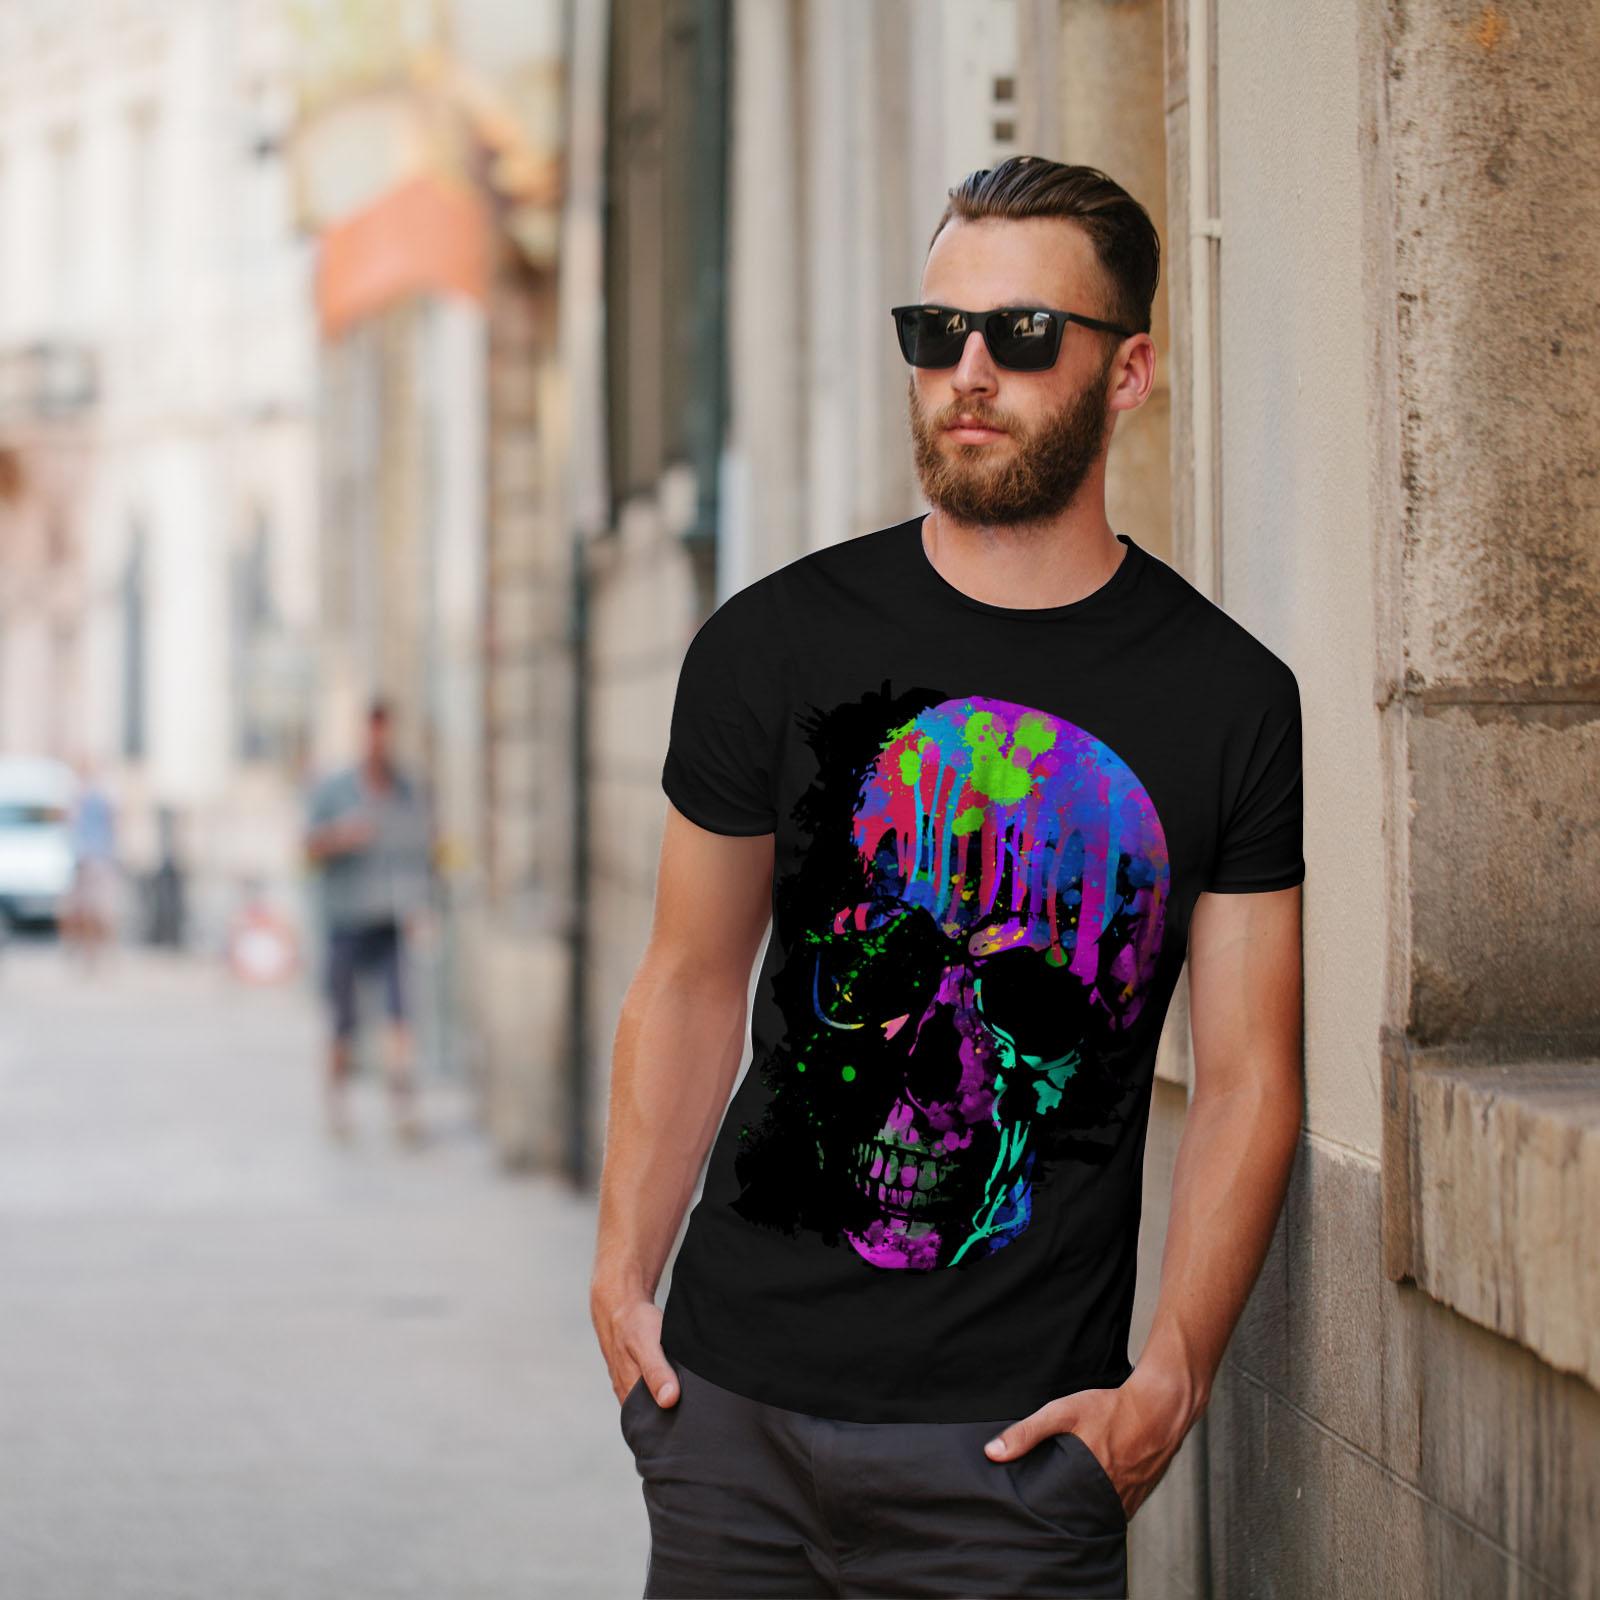 Wellcoda-Skull-Artsy-Mens-T-shirt-Neon-Night-Graphic-Design-Printed-Tee thumbnail 5